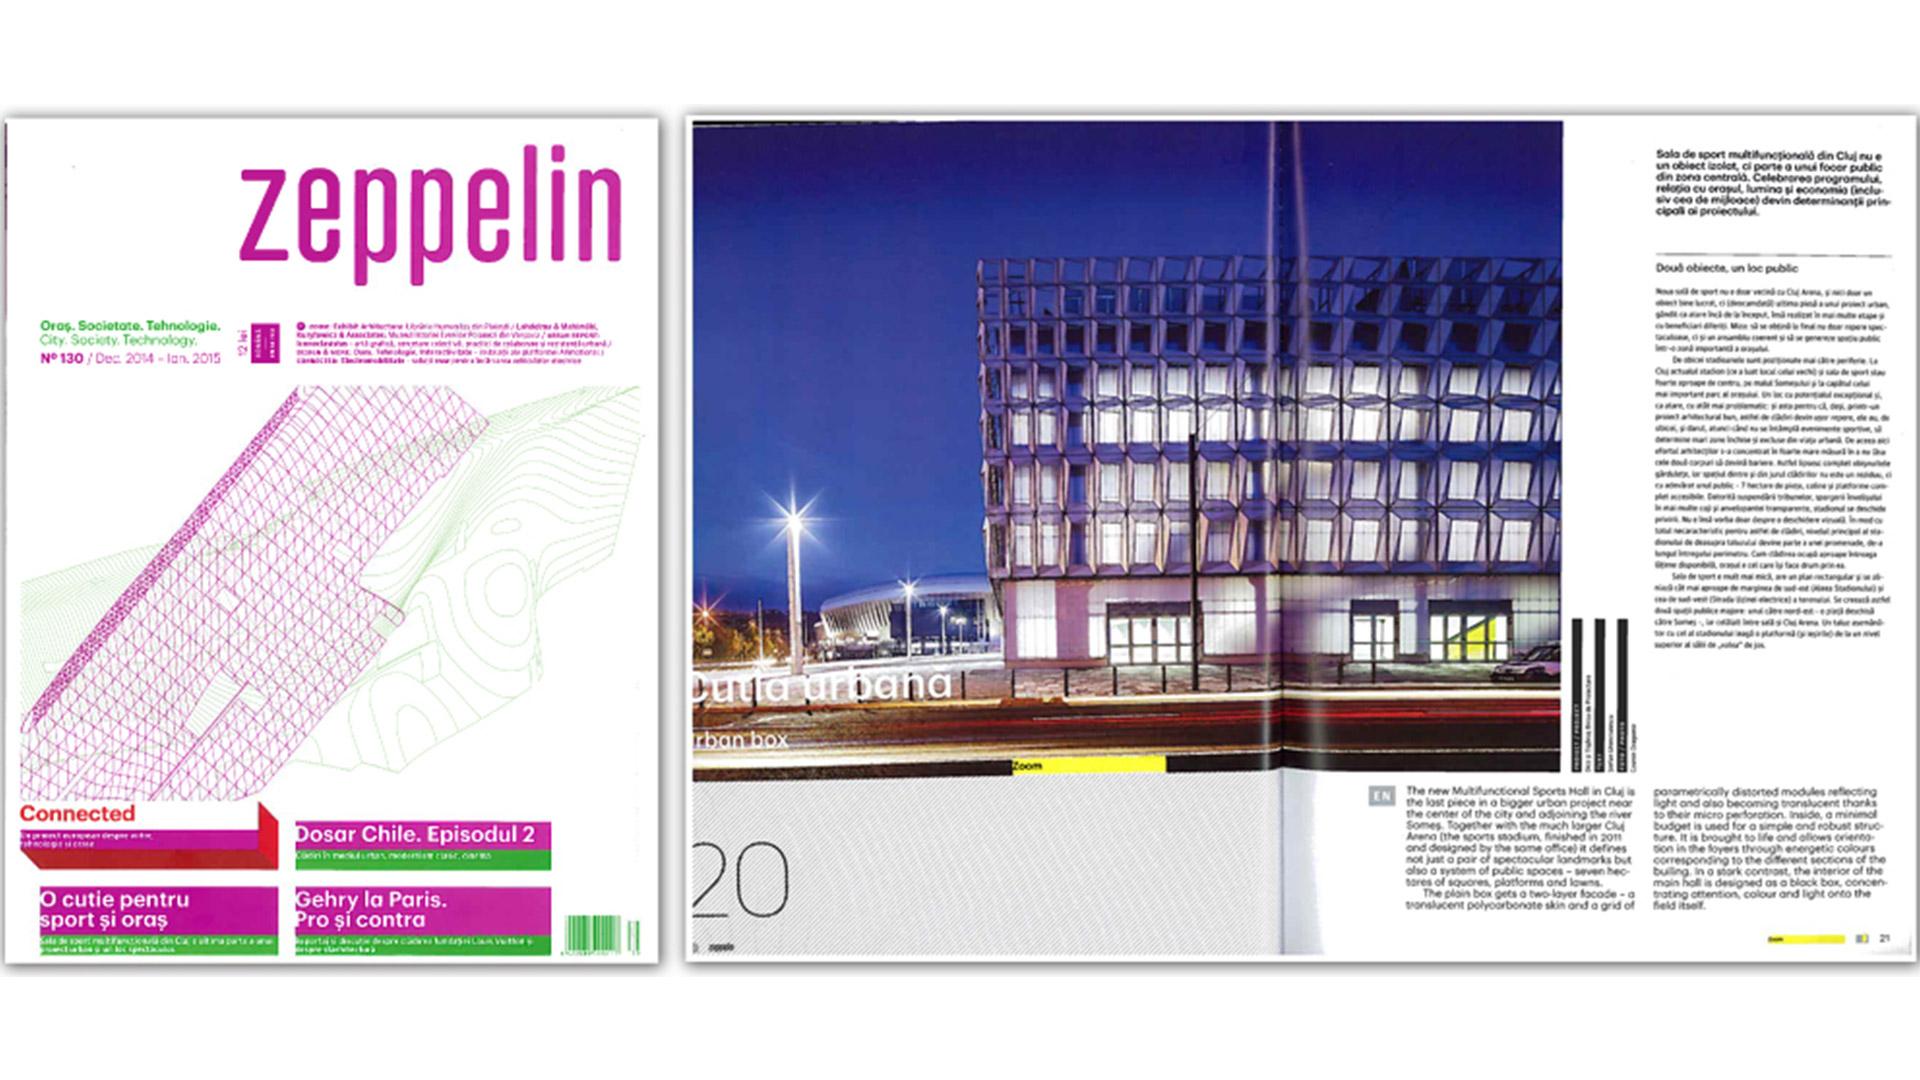 Zeppelin Magazine, BT Arena, 2015